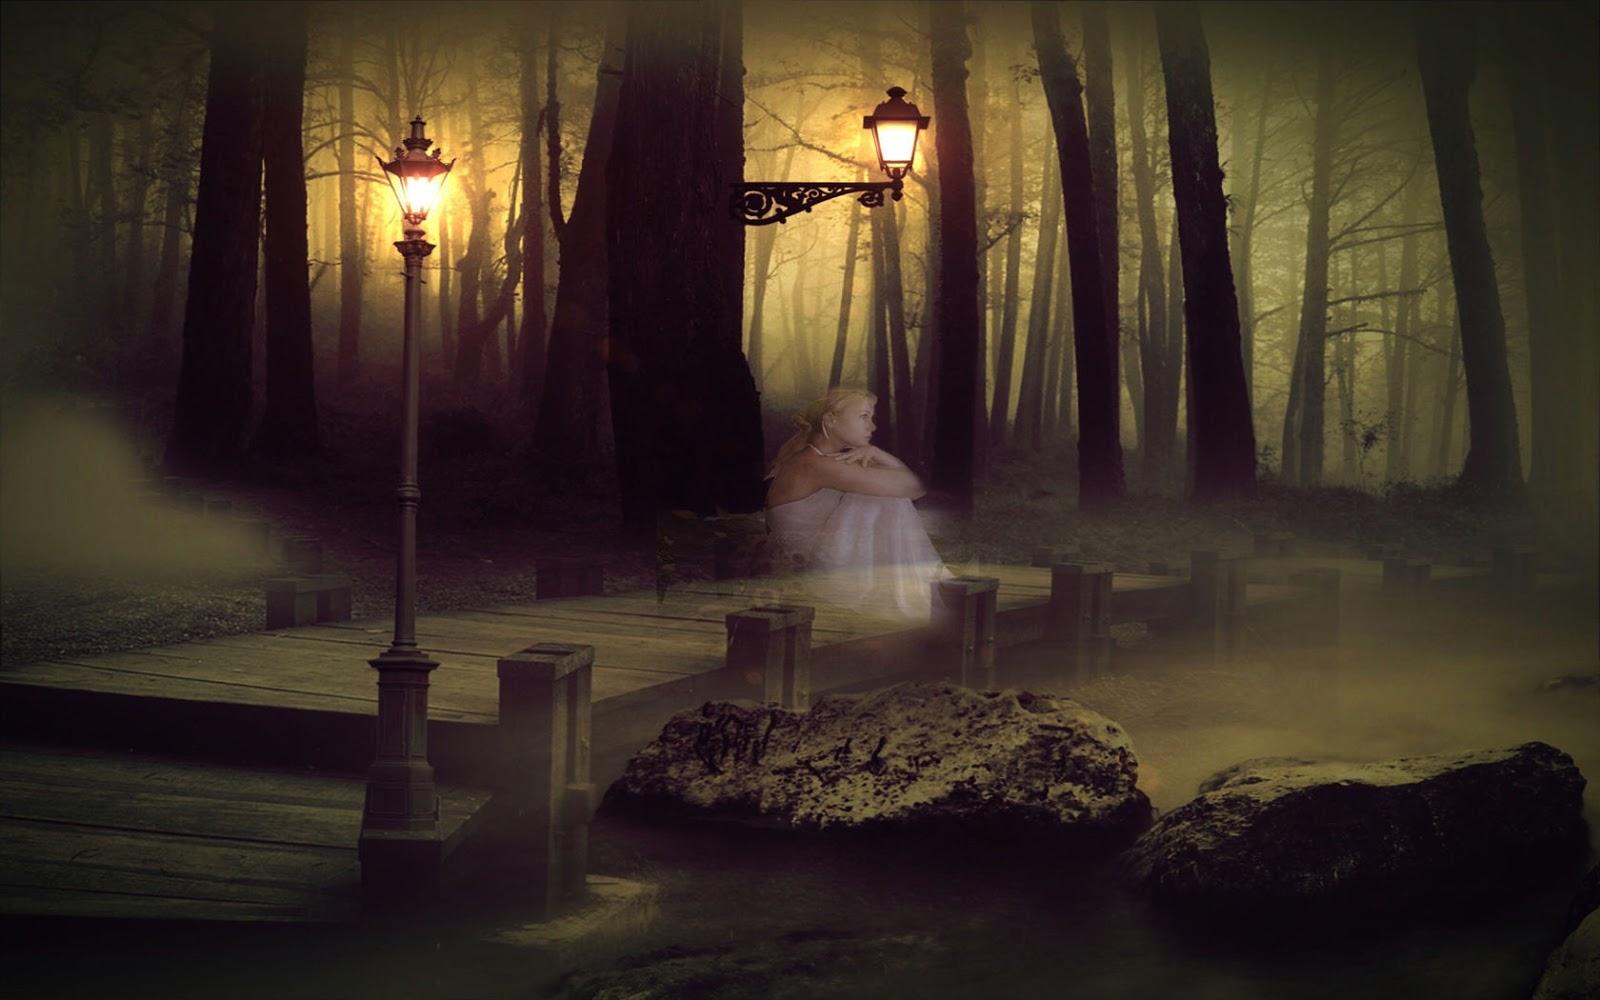 Halloween Tumblr Backgrounds 2014 by ibjennyjenny